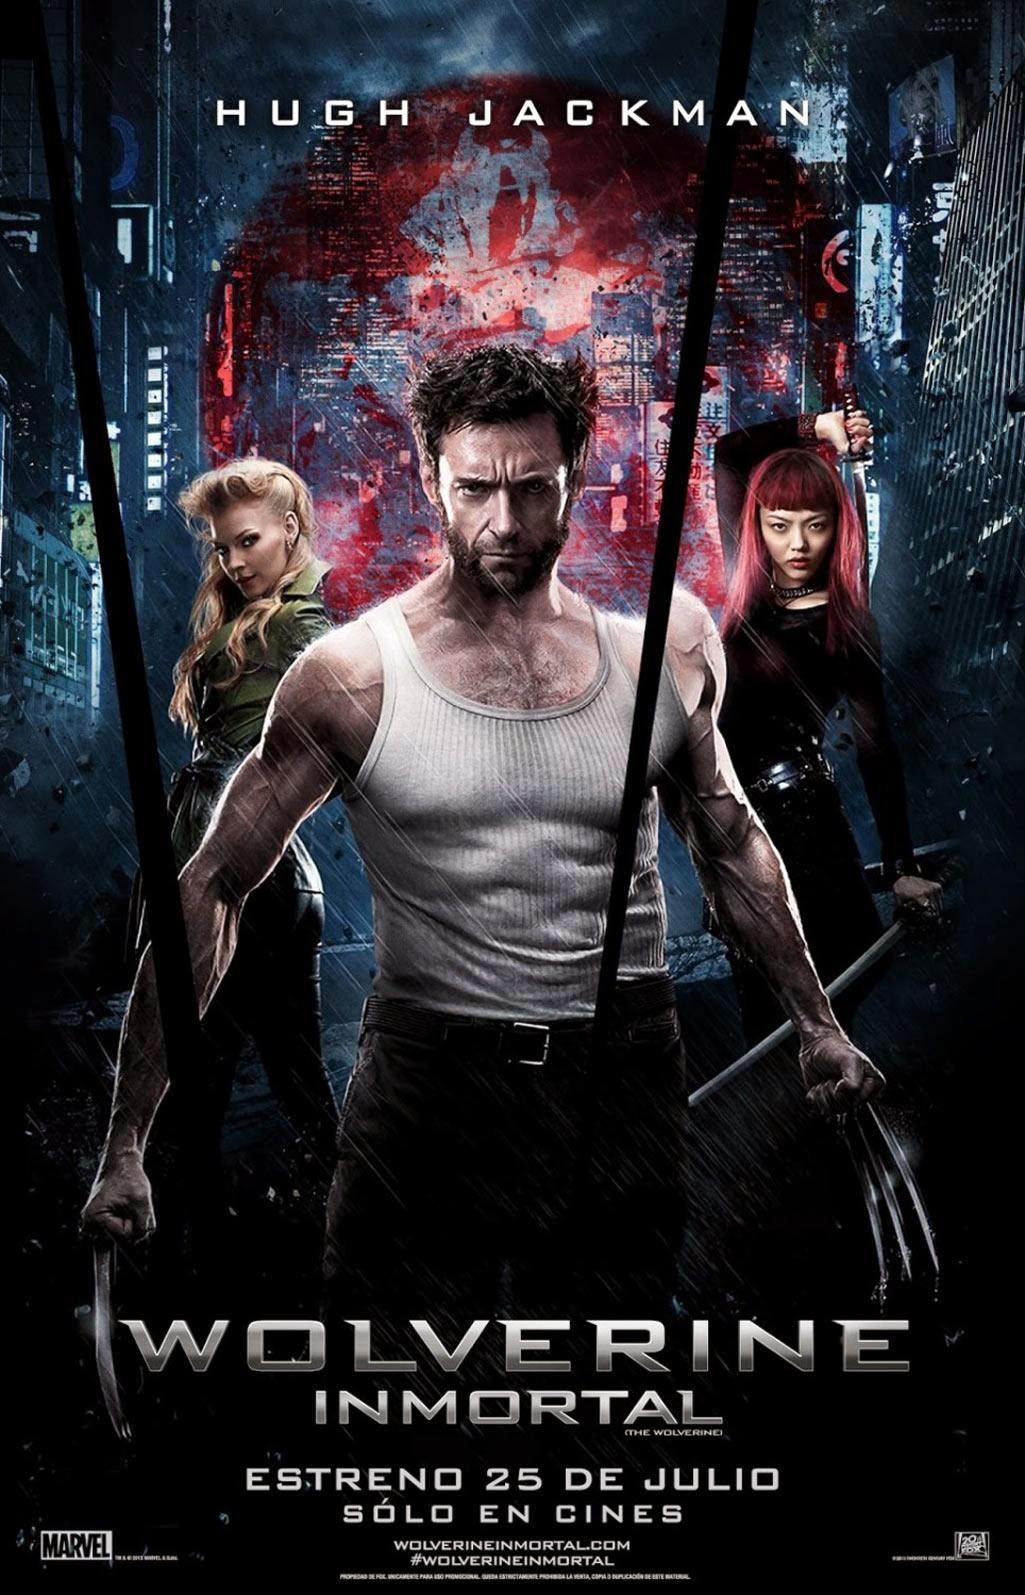 The Wolverine เดอะ วูล์ฟเวอรีน [HD][พากย์ไทย]